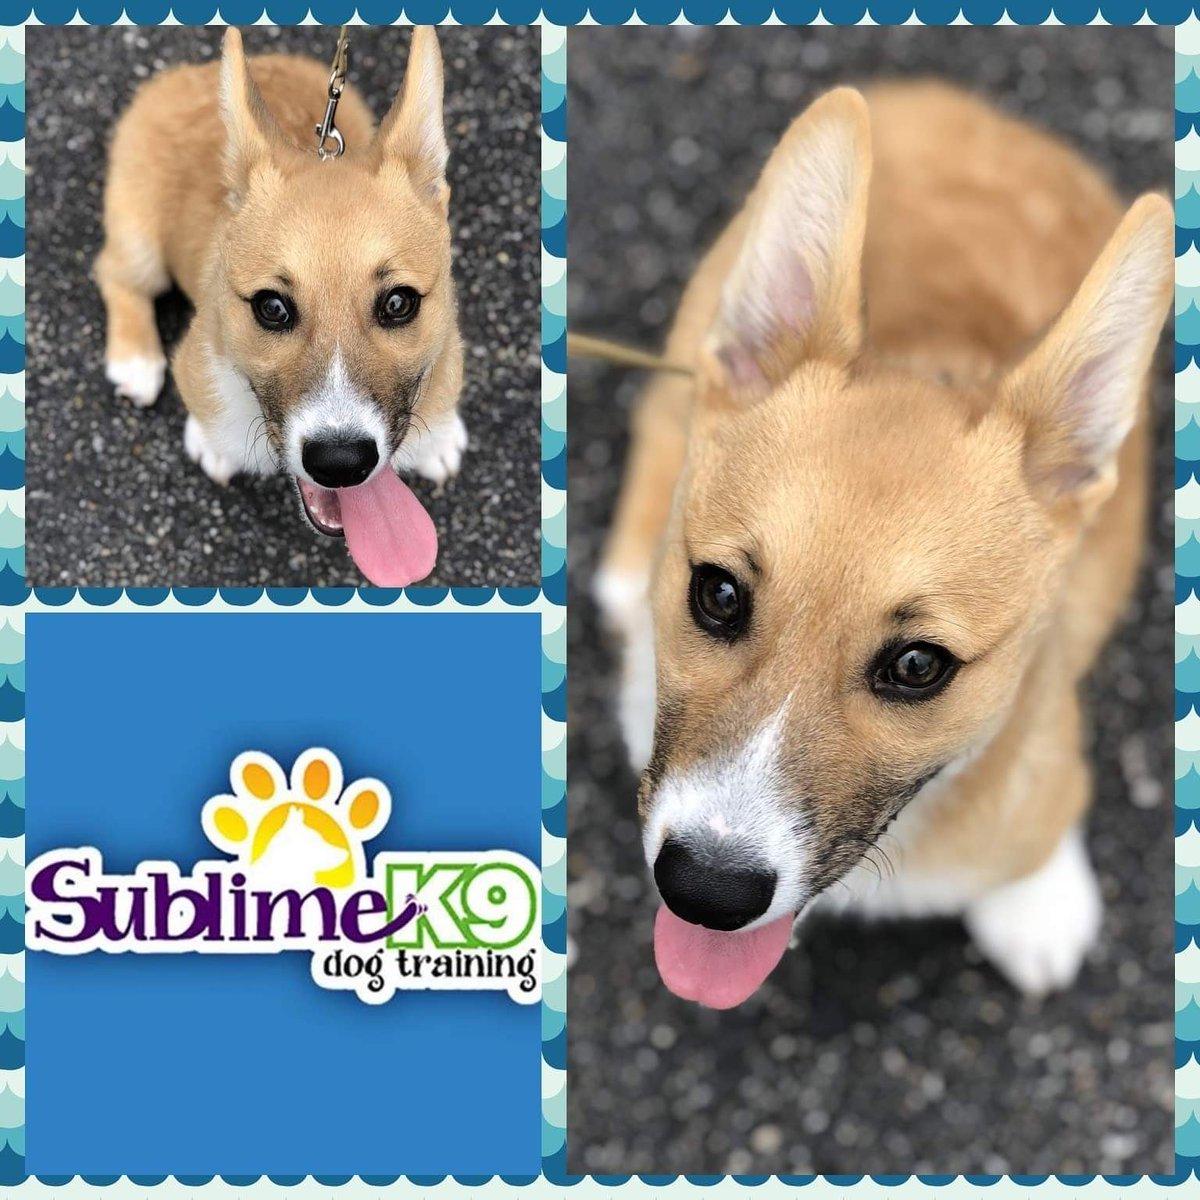 Sublime K9 Puppy Graduate 🎓 Mr. Potato  http://sublimek9dogtraining.com  #nassaucounty #therapydogtraining #obediencetraining #suffolkcounty #recall #place #impulsecontrol #dogtrainers #puppytraining